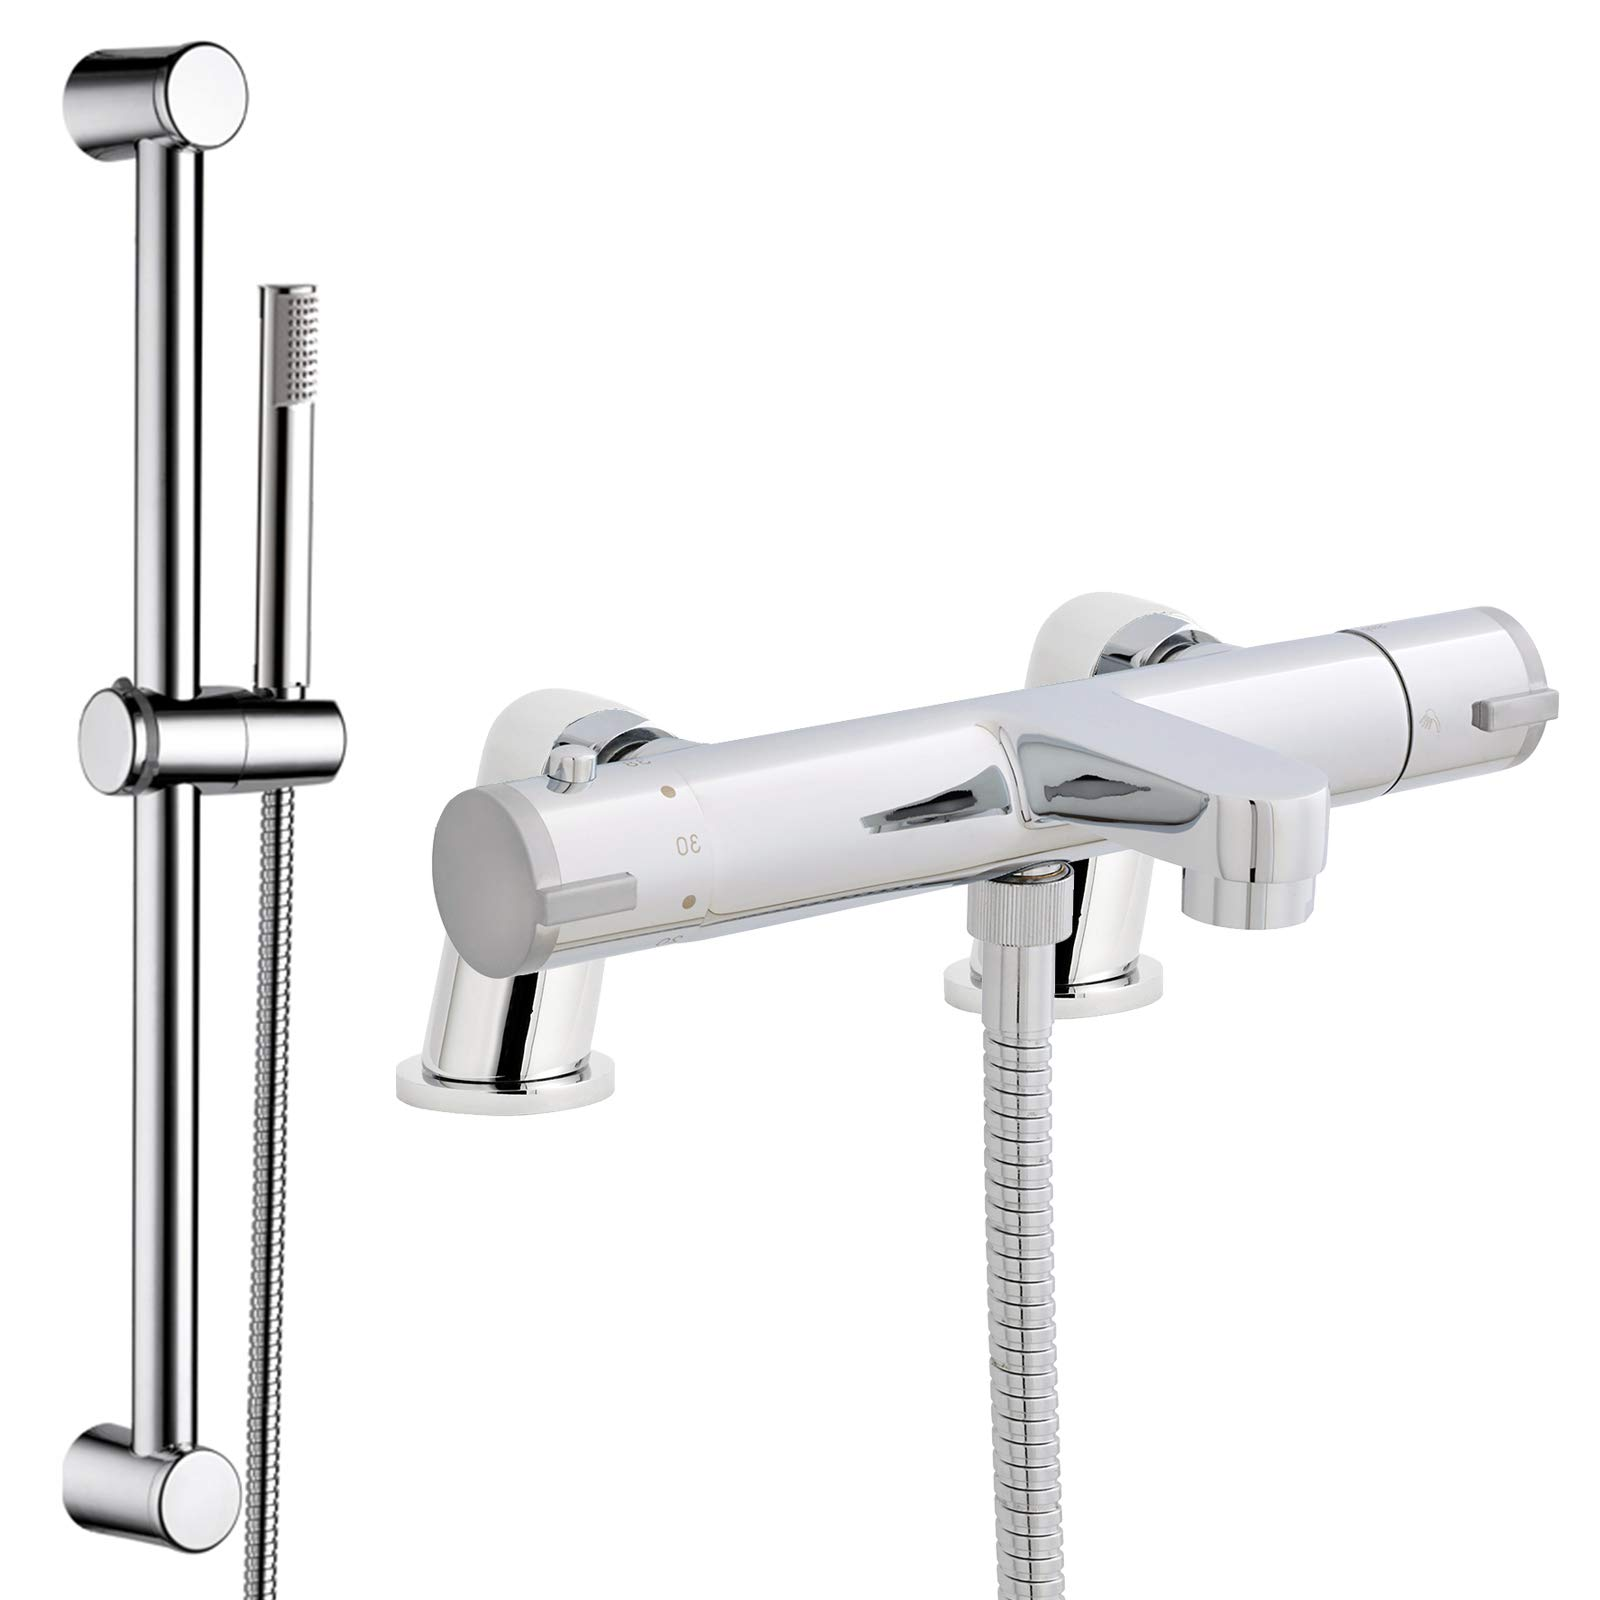 Chrome Thermostatic Modern Bath Shower Mixer Tap with Chrome Shower Rail Kit *E